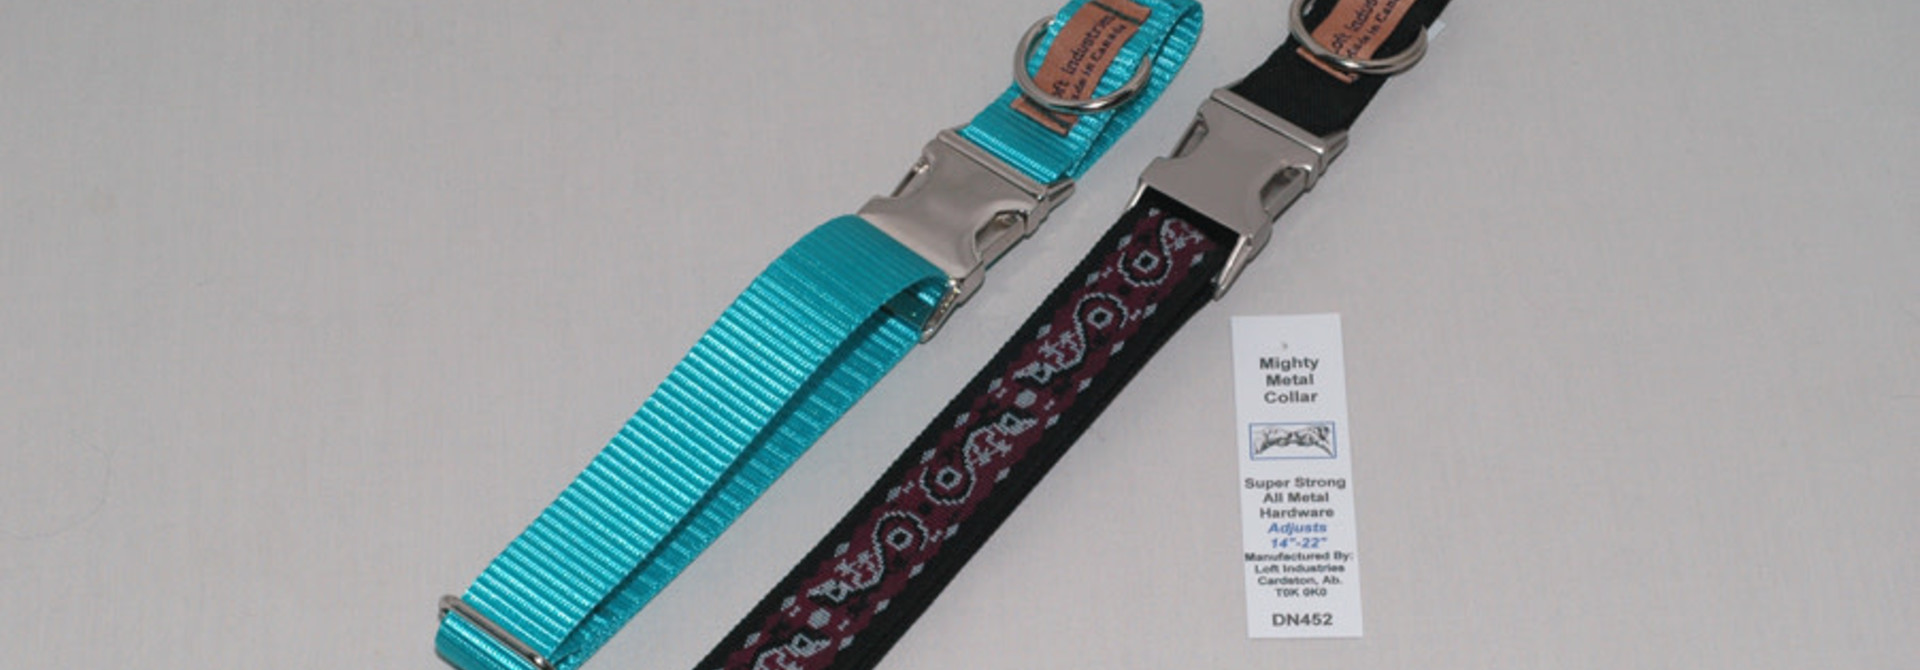 "1"" Adjustable Collar with Metal Double Bar Buckle Black"